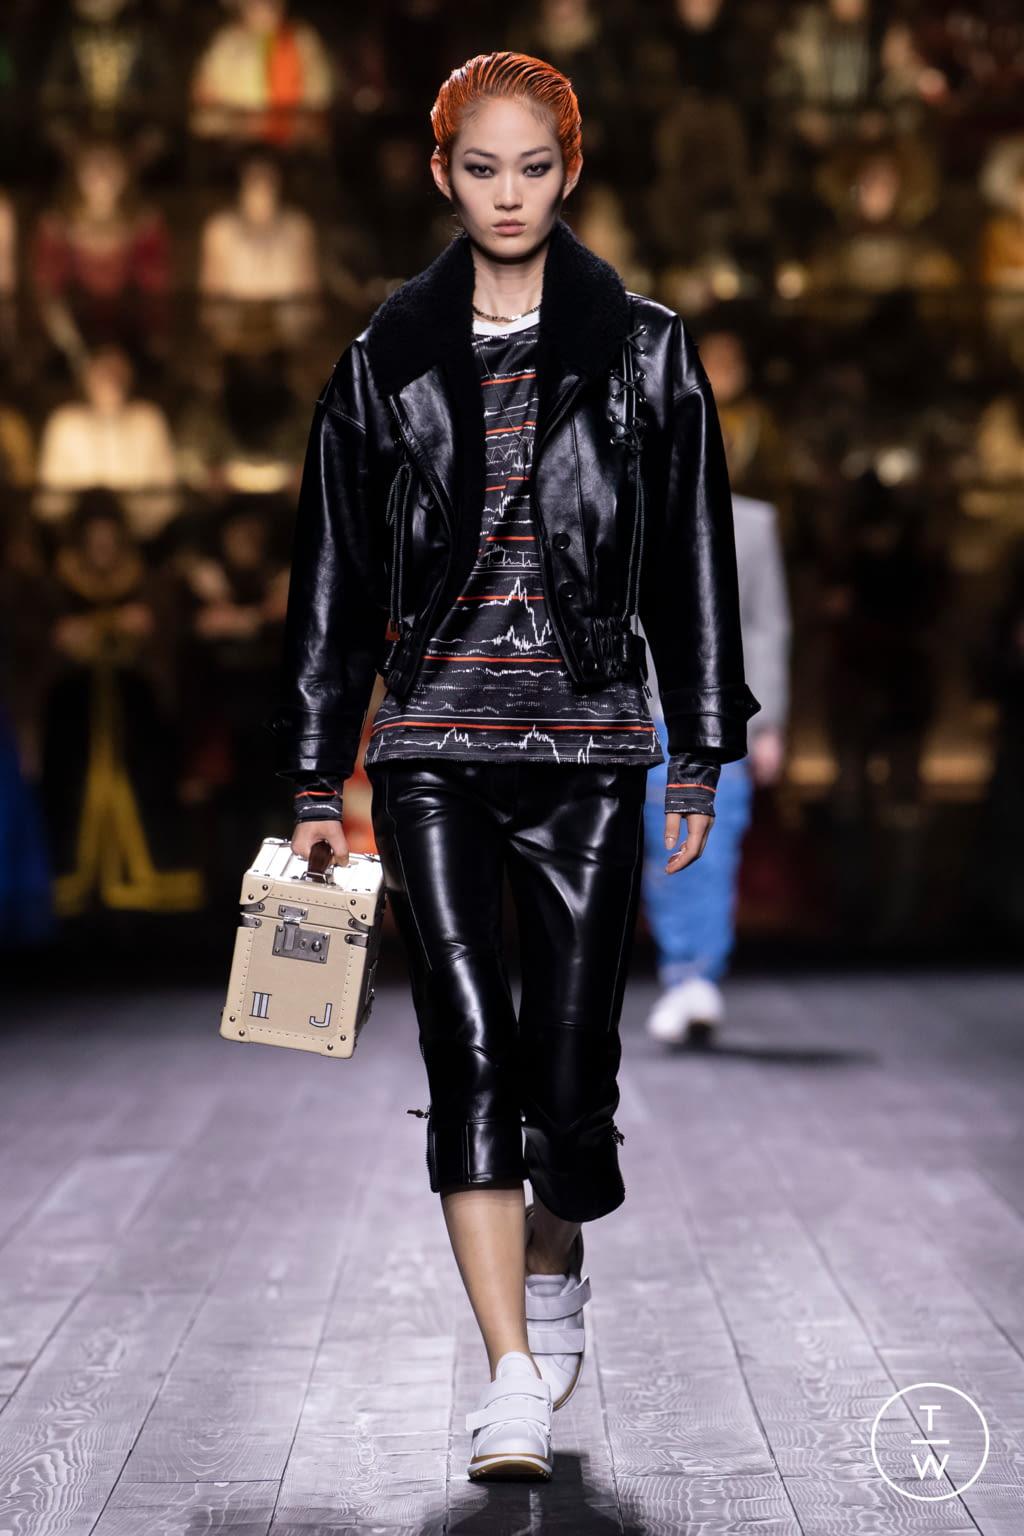 Fashion Week Paris Fall/Winter 2020 look 33 de la collection Louis Vuitton womenswear